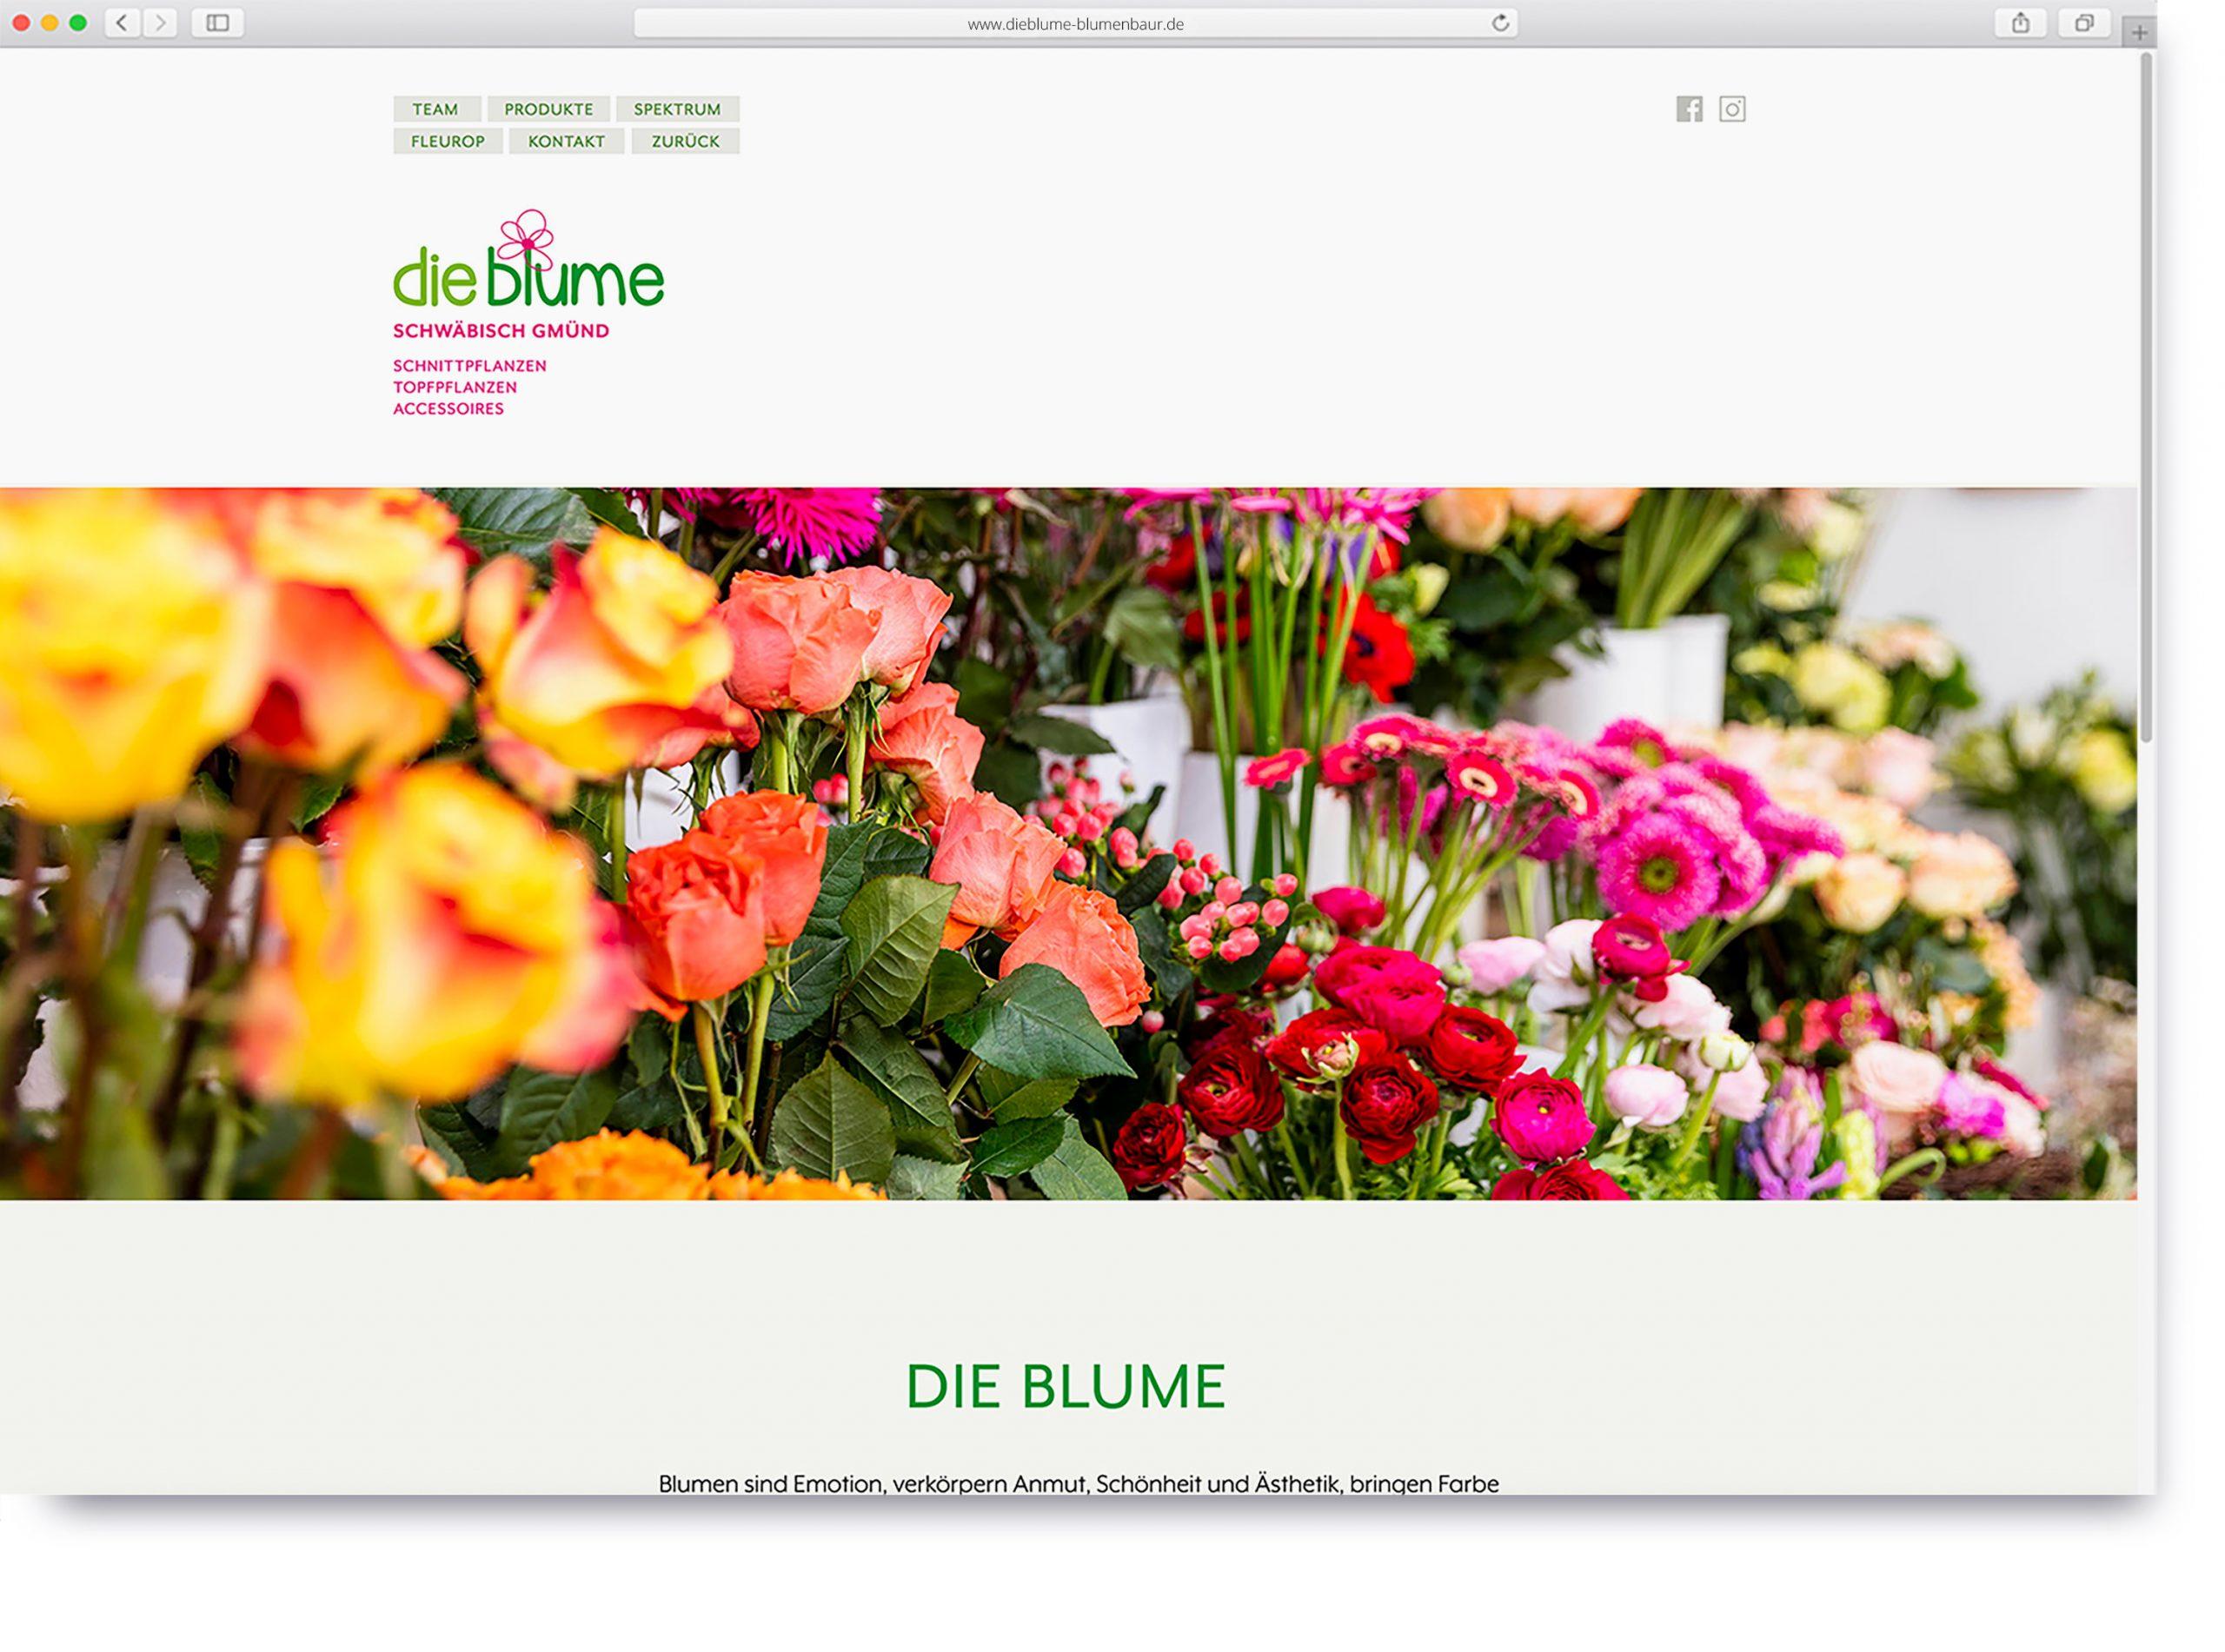 dieblume-blumenbaur-website-2-scaled.jpg